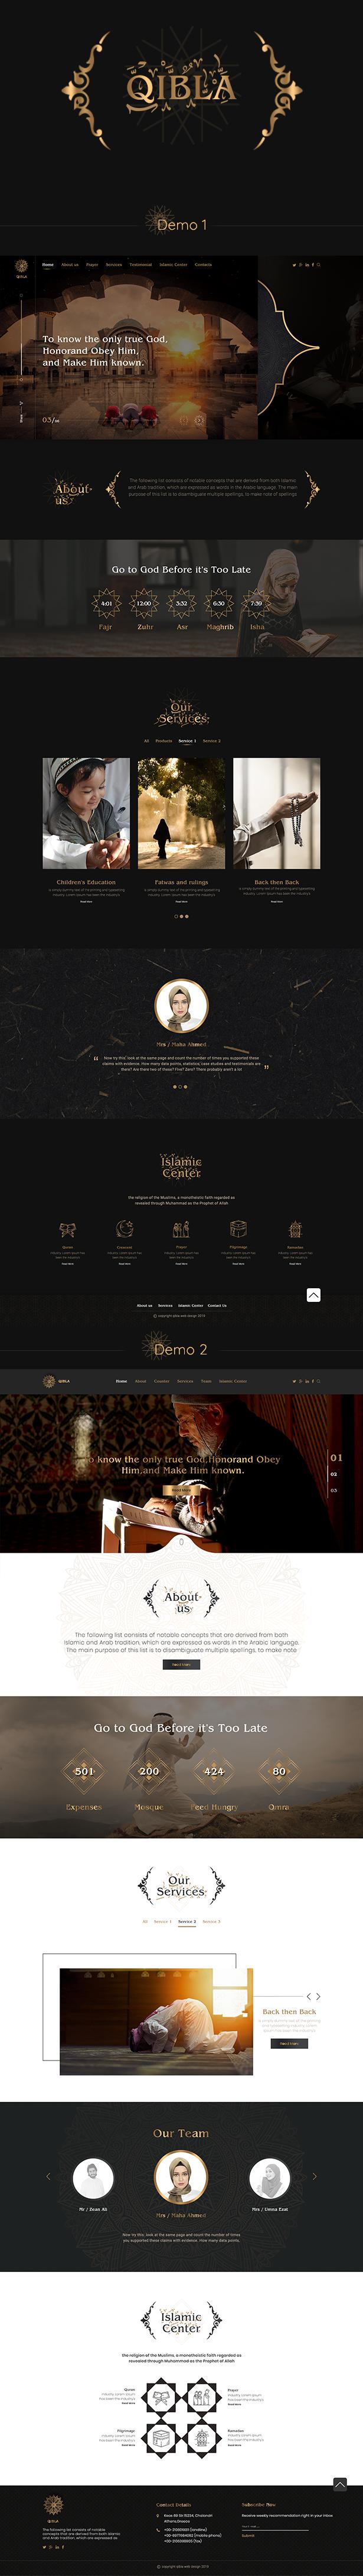 Qibla - Islamic Center PSD Template - 1